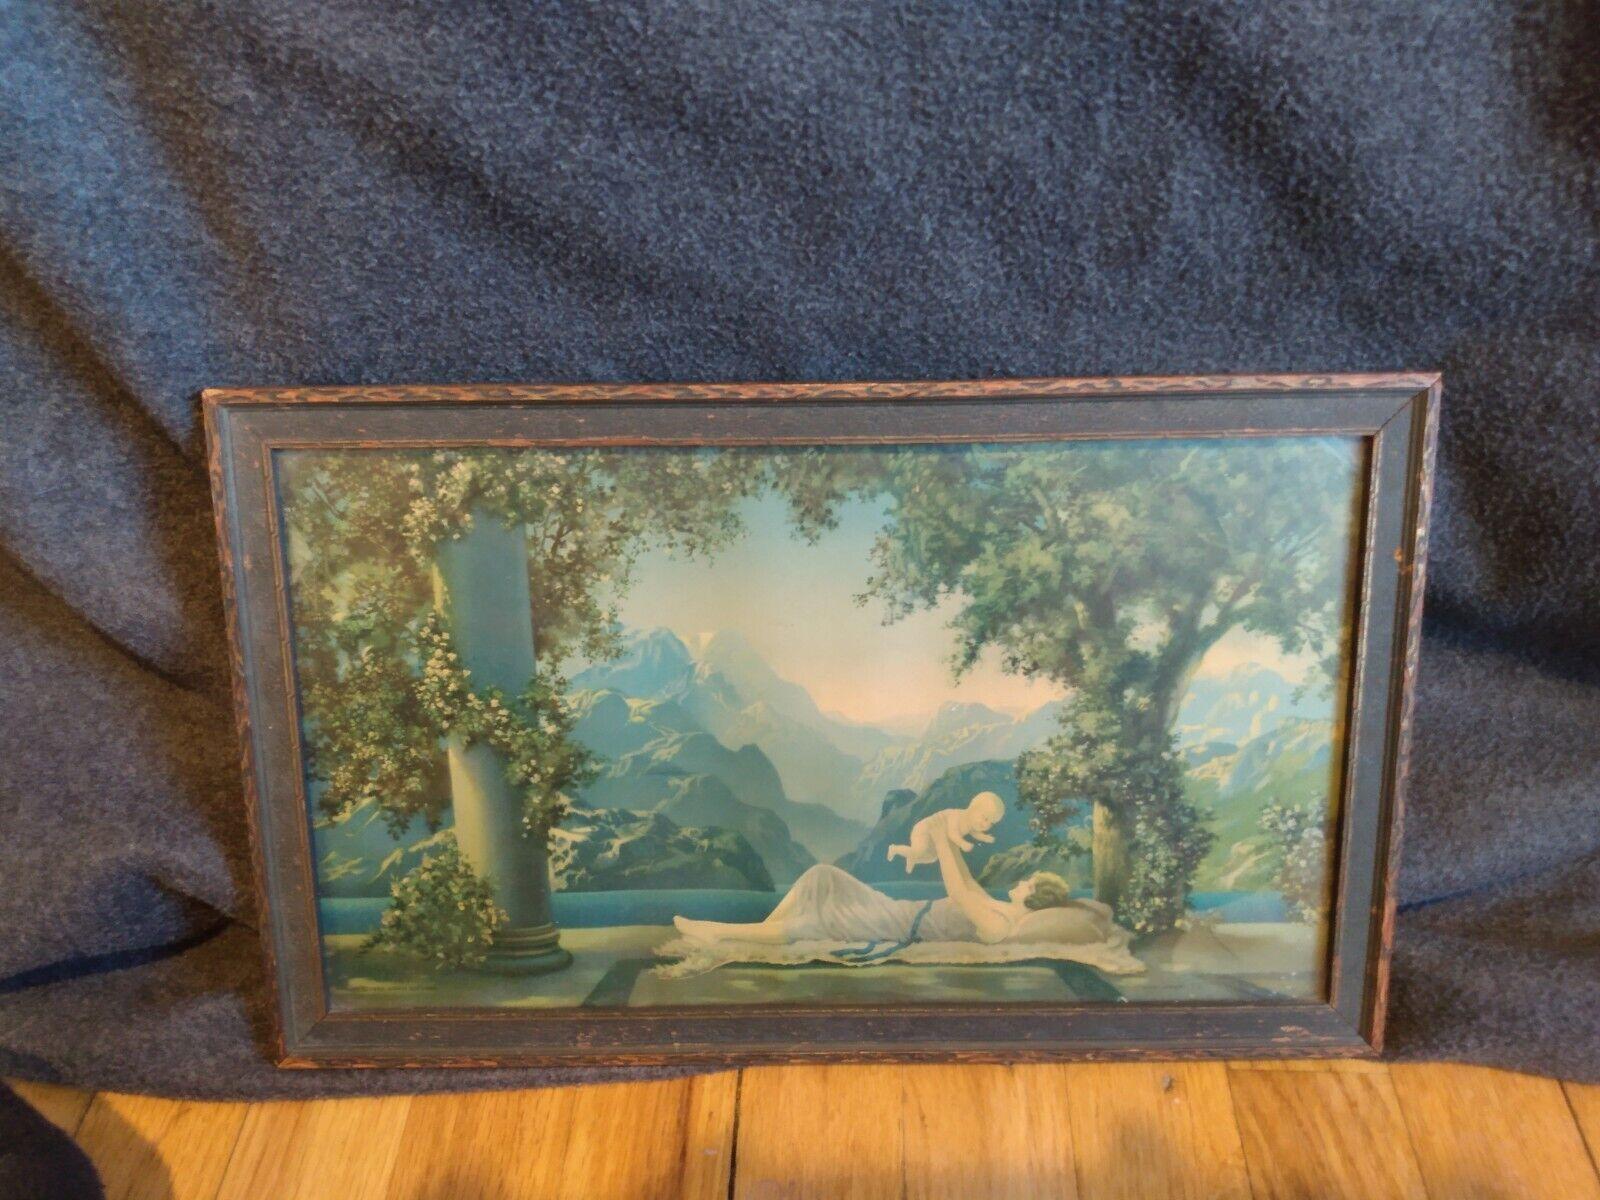 Original 1925 Art Deco Lithograph Print R Atkinson Fox Love s Paradise Framed - $24.50